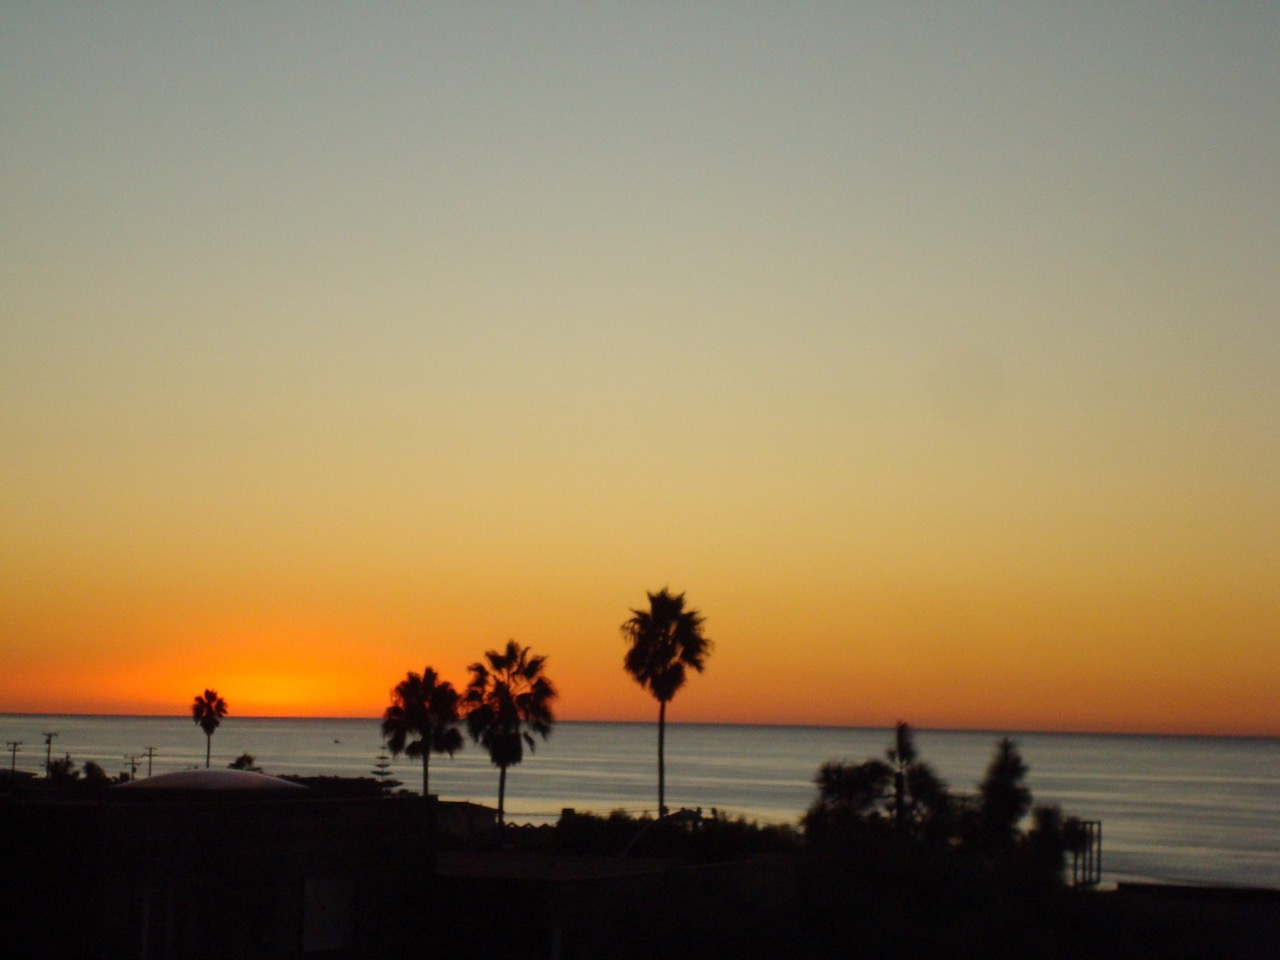 419-Camino-De-Las-Colinas-sunset-view3-from-Linda